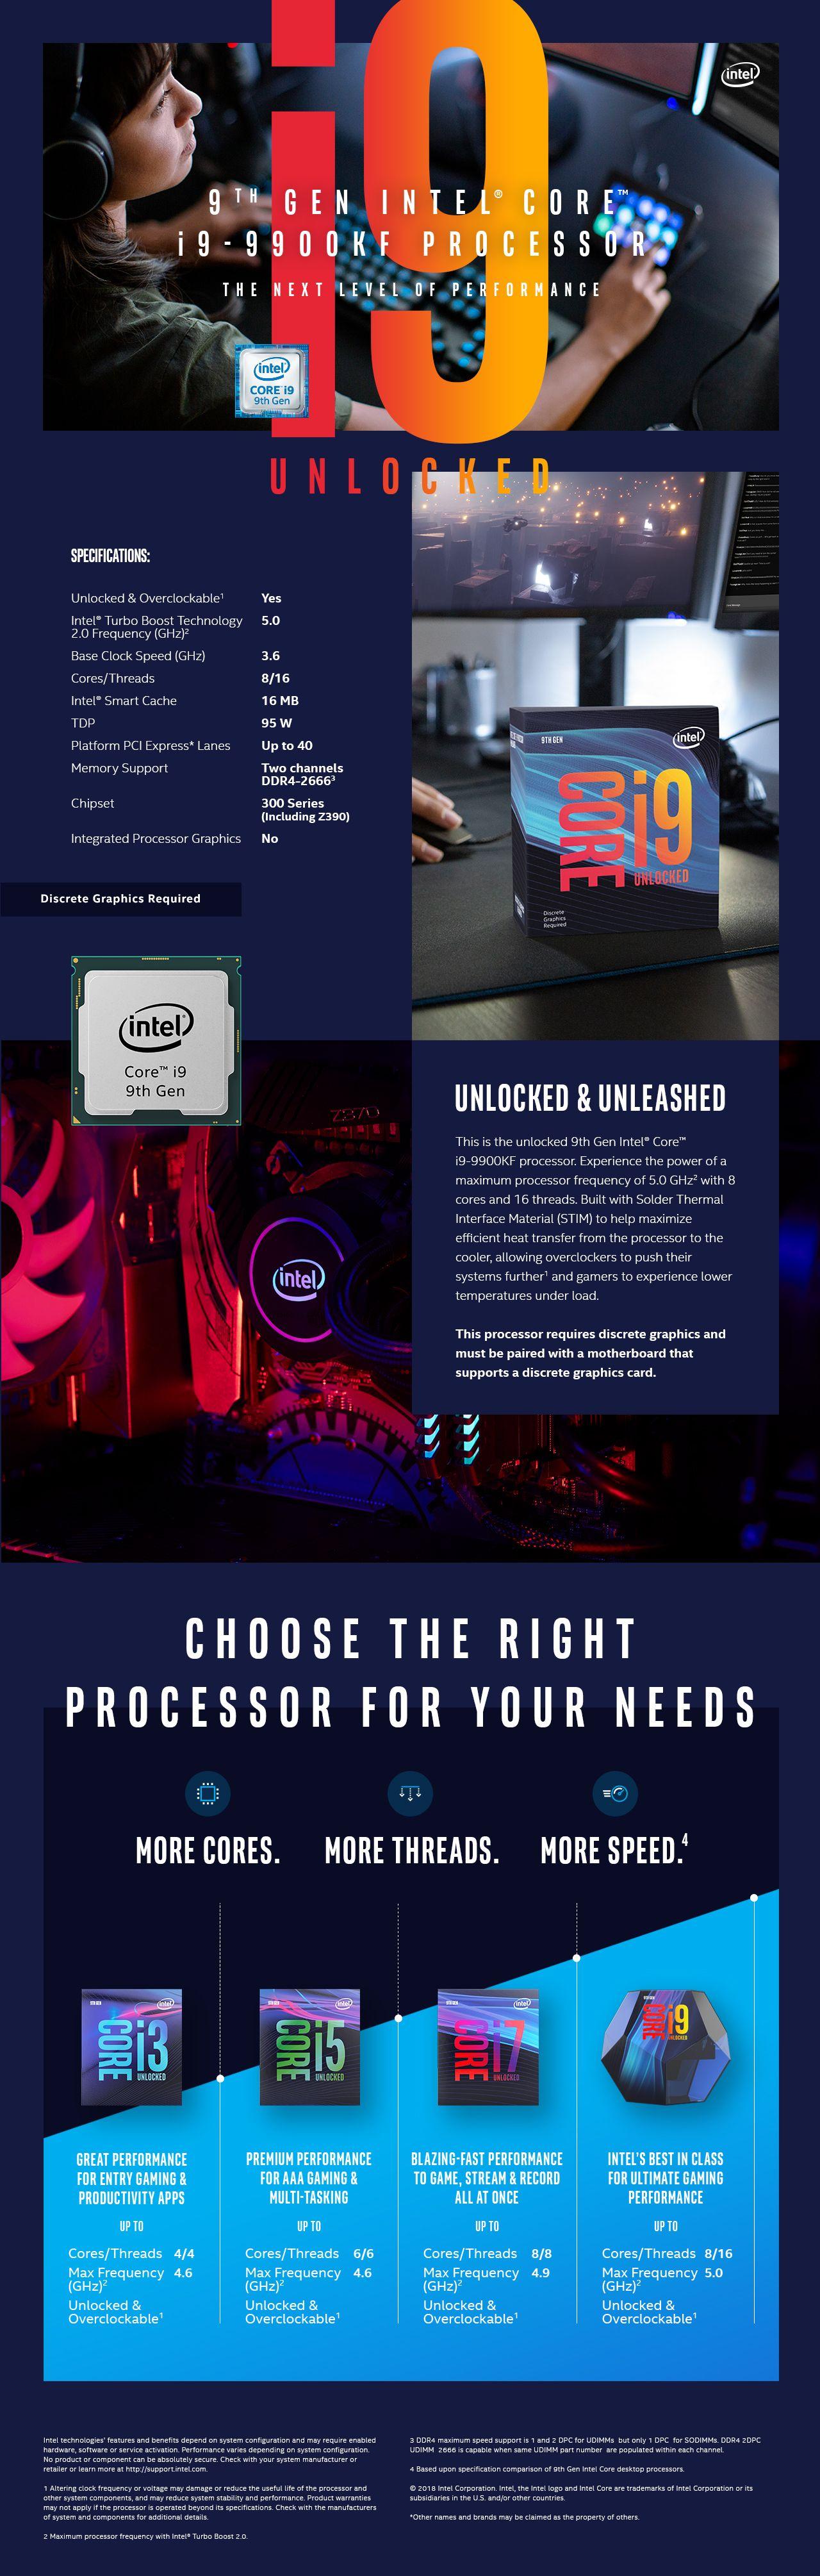 Intel Core i9-9900KF Coffee Lake 8-Core, 16-Thread, 3 6 GHz (5 0 GHz Turbo)  LGA 1151 (300 Series) 95W BX80684I99900KF Desktop Processor Without